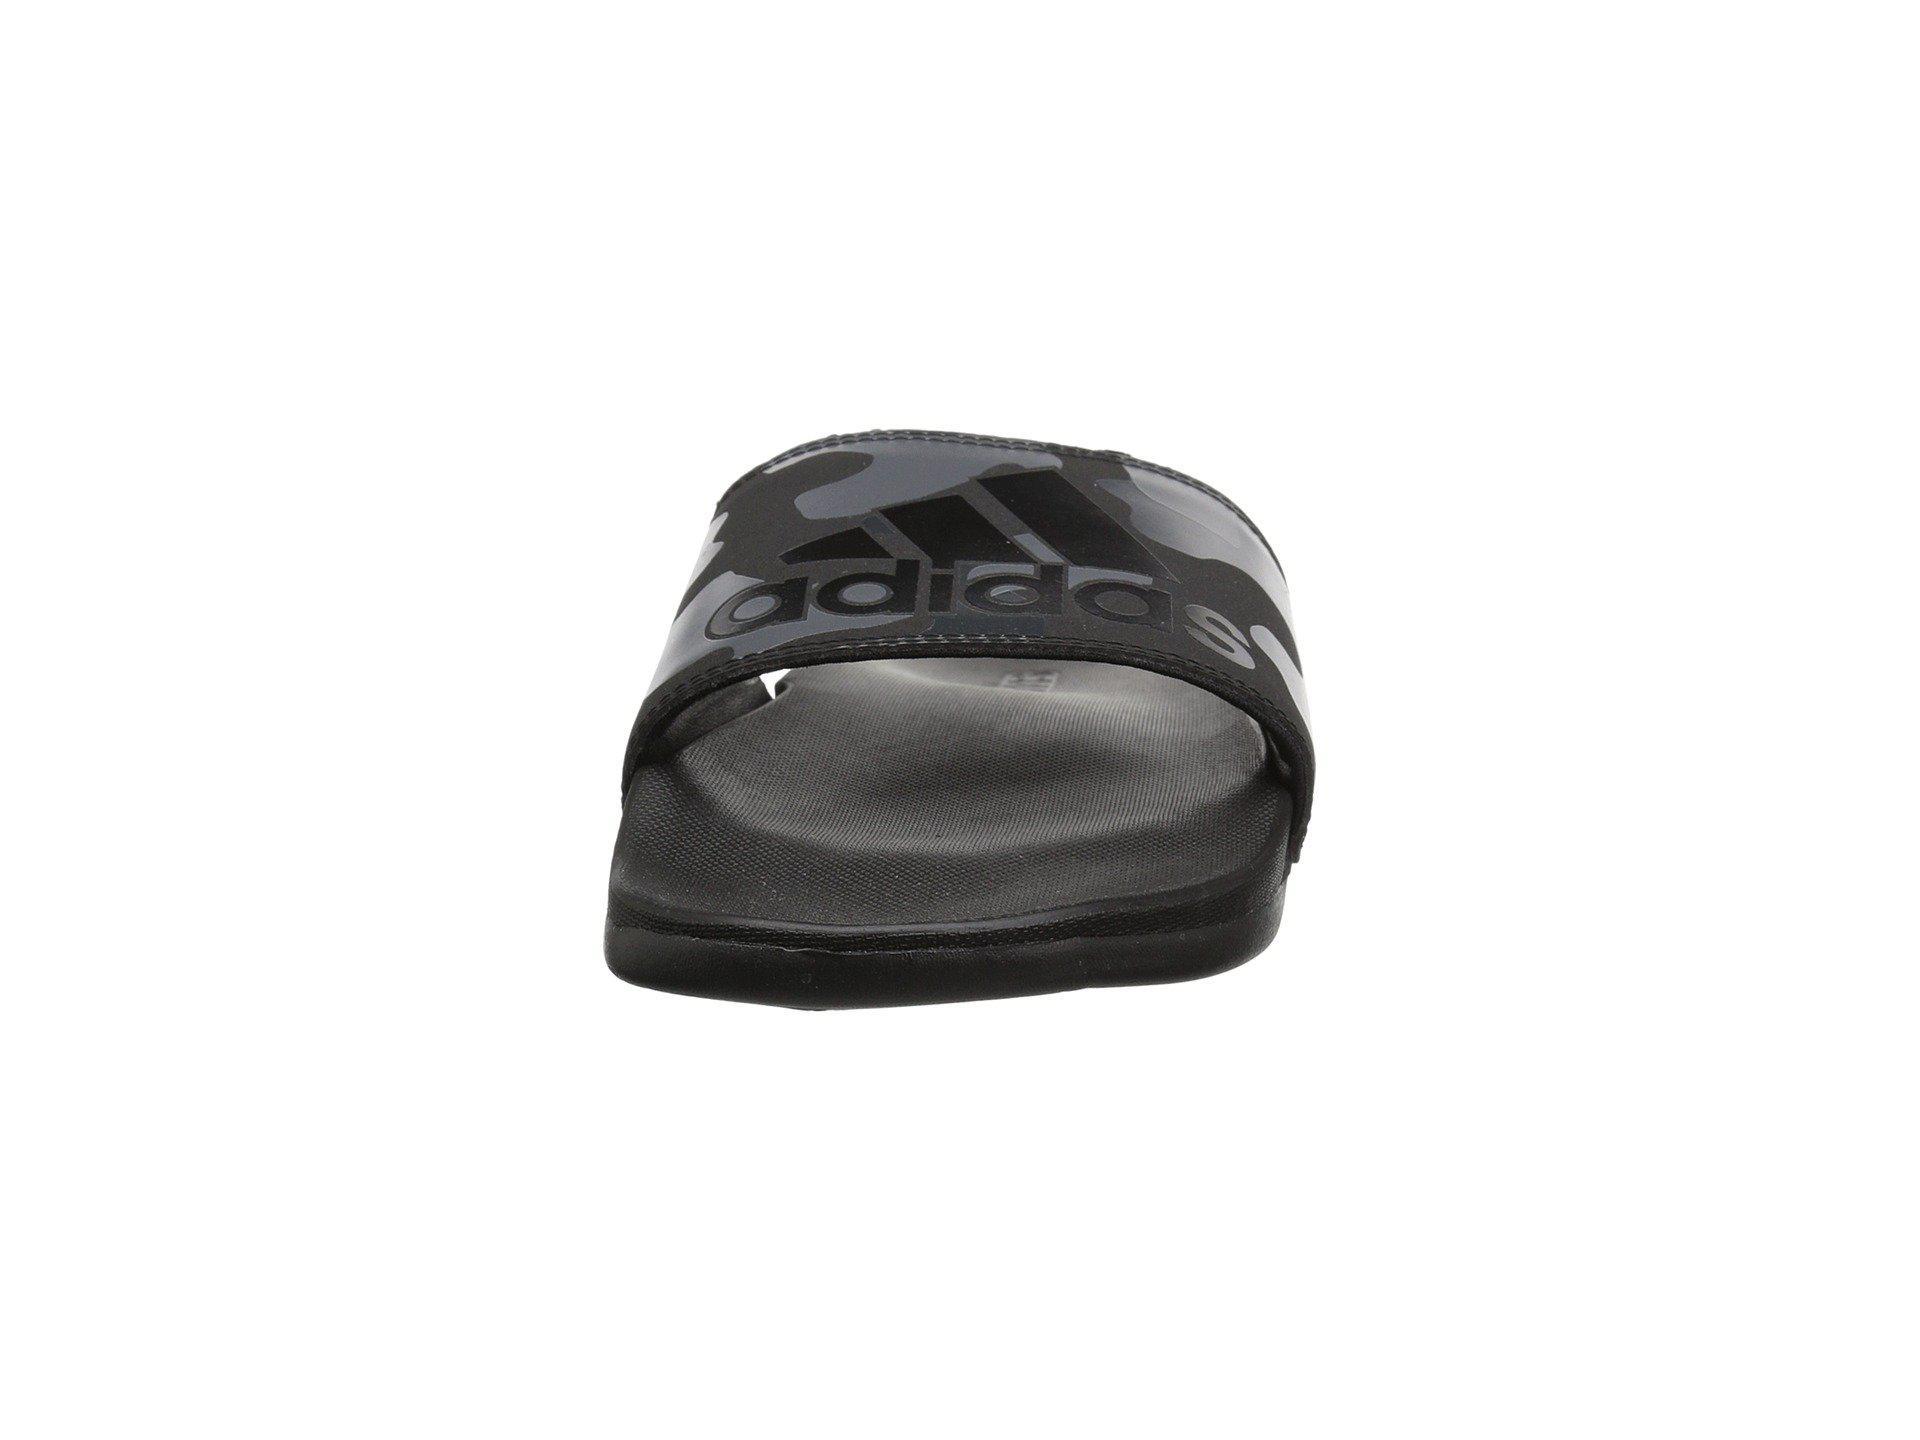 b4f4866254e9a7 Lyst - adidas Adilette Cf+ Link Gr (black white carbon) Men s Slide ...